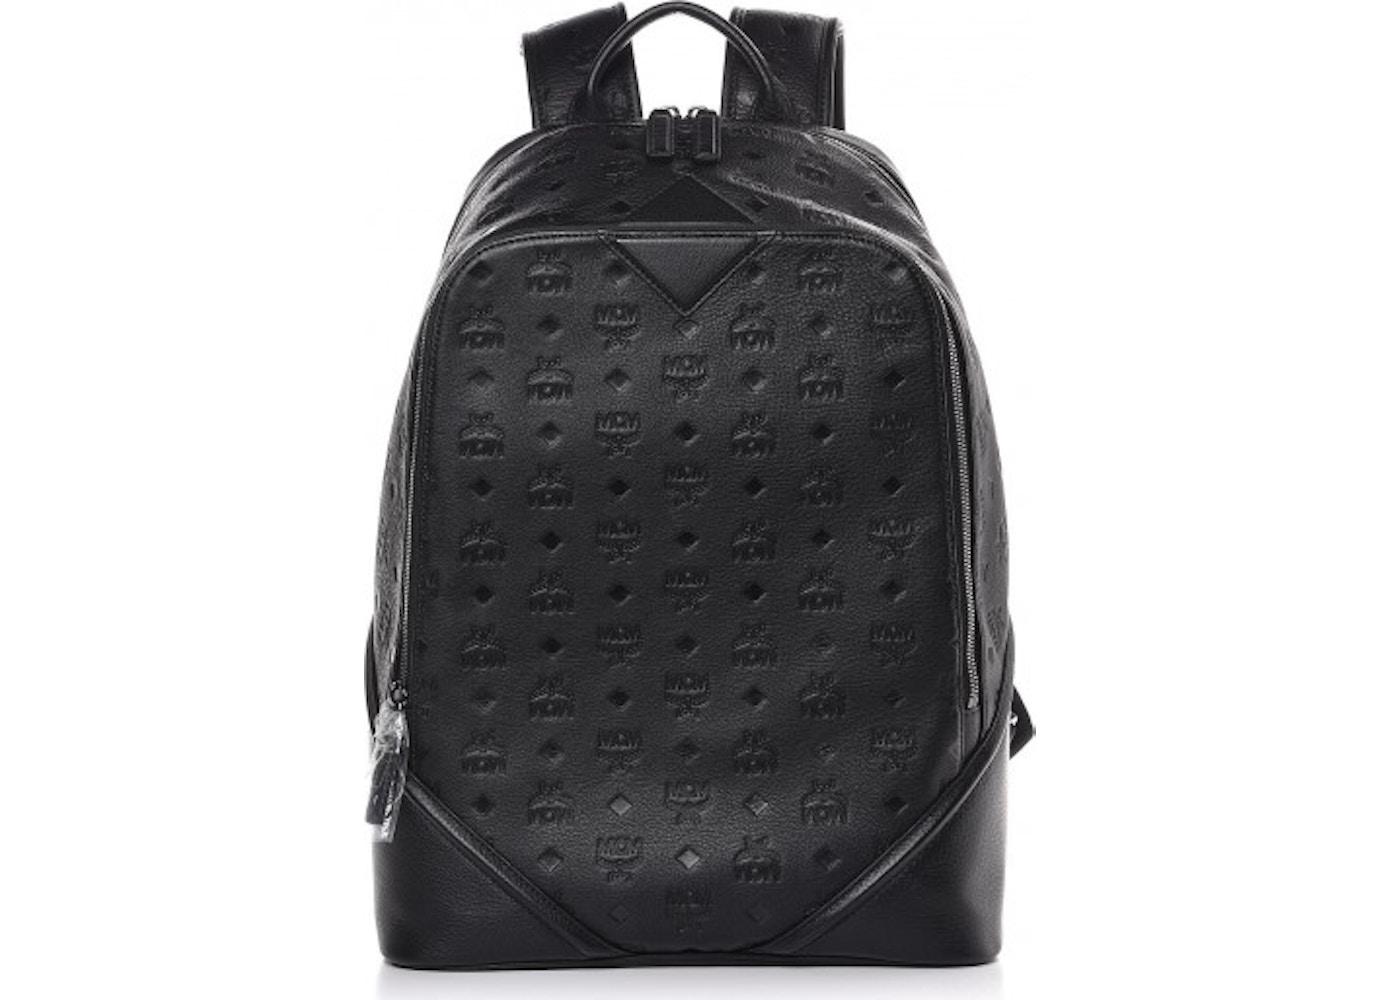 0b470c6b5 MCM Backpack Monogram Ottomar Leather Black